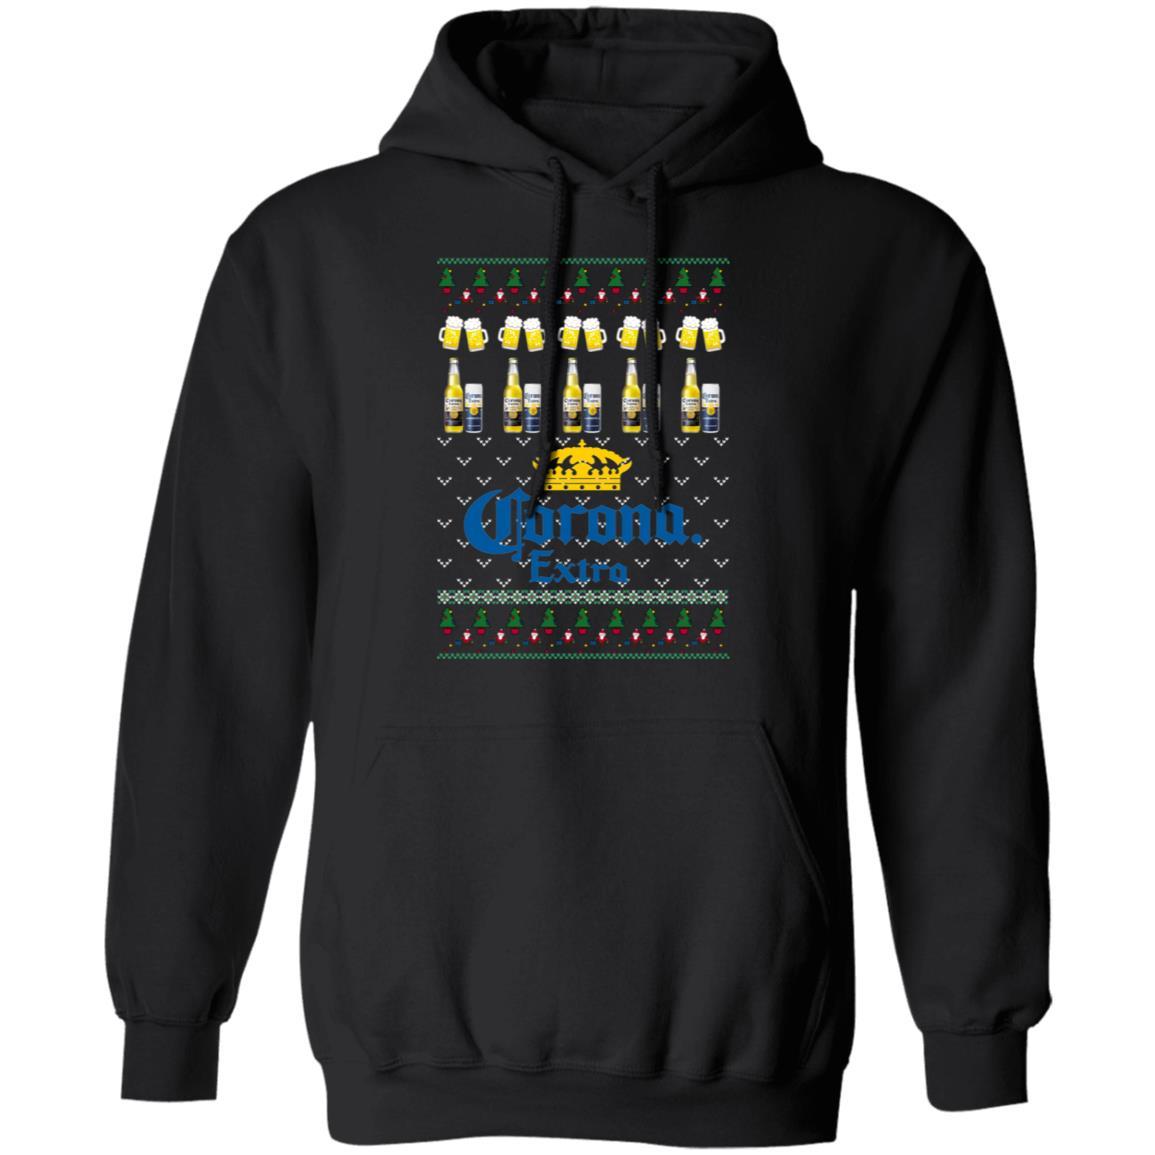 Beer Christmas Sweater.Corona Extra Beer Ugly Christmas Sweater Hoodie